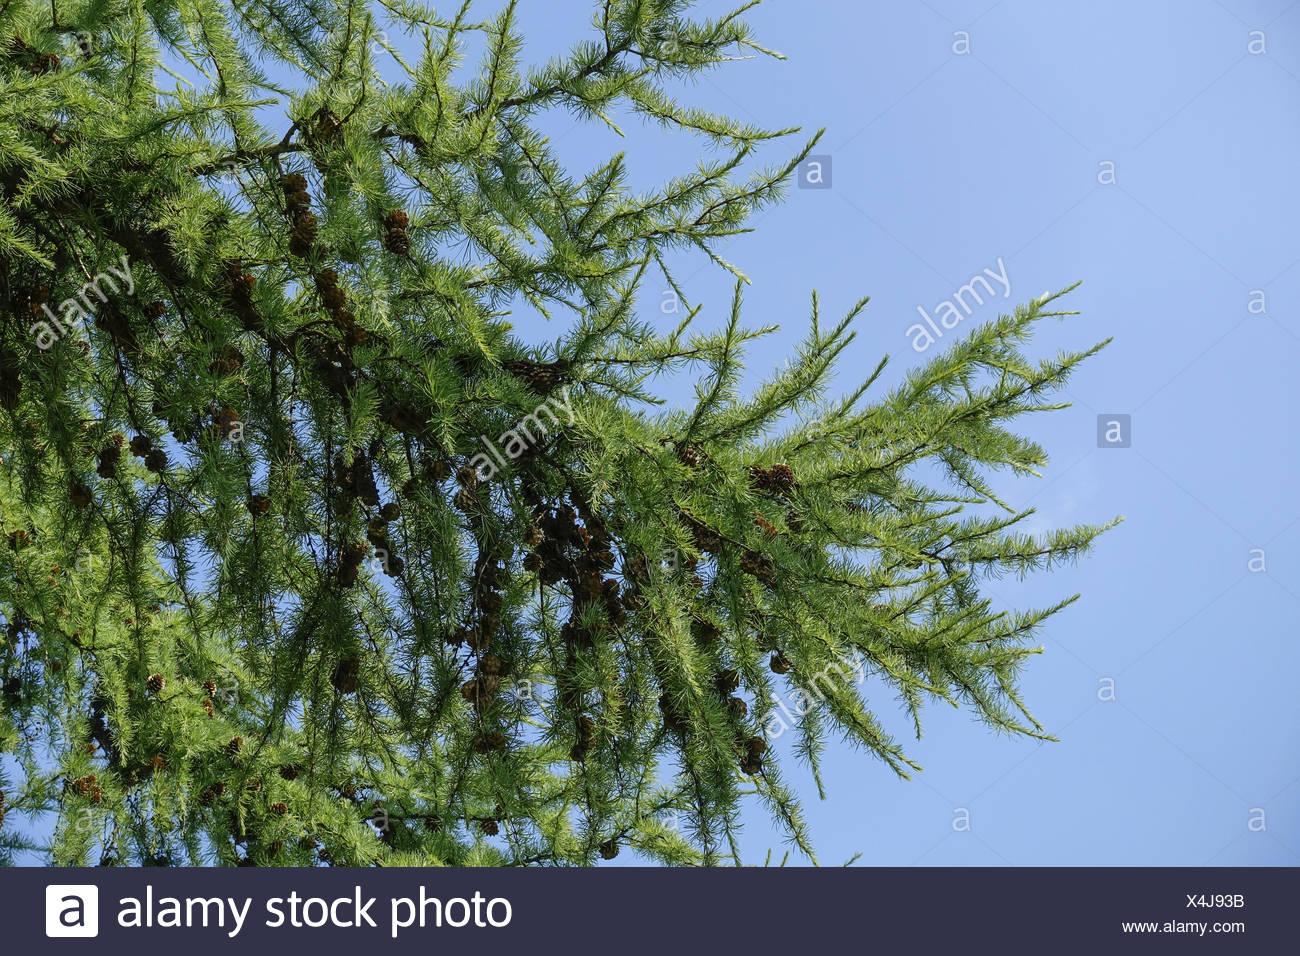 grüne Lärche (Larix) mit Lärchenzapfen, blauer Himmel, green larch (Larix) with larch cones, blue sky, branch, tree, botany, tre - Stock Image